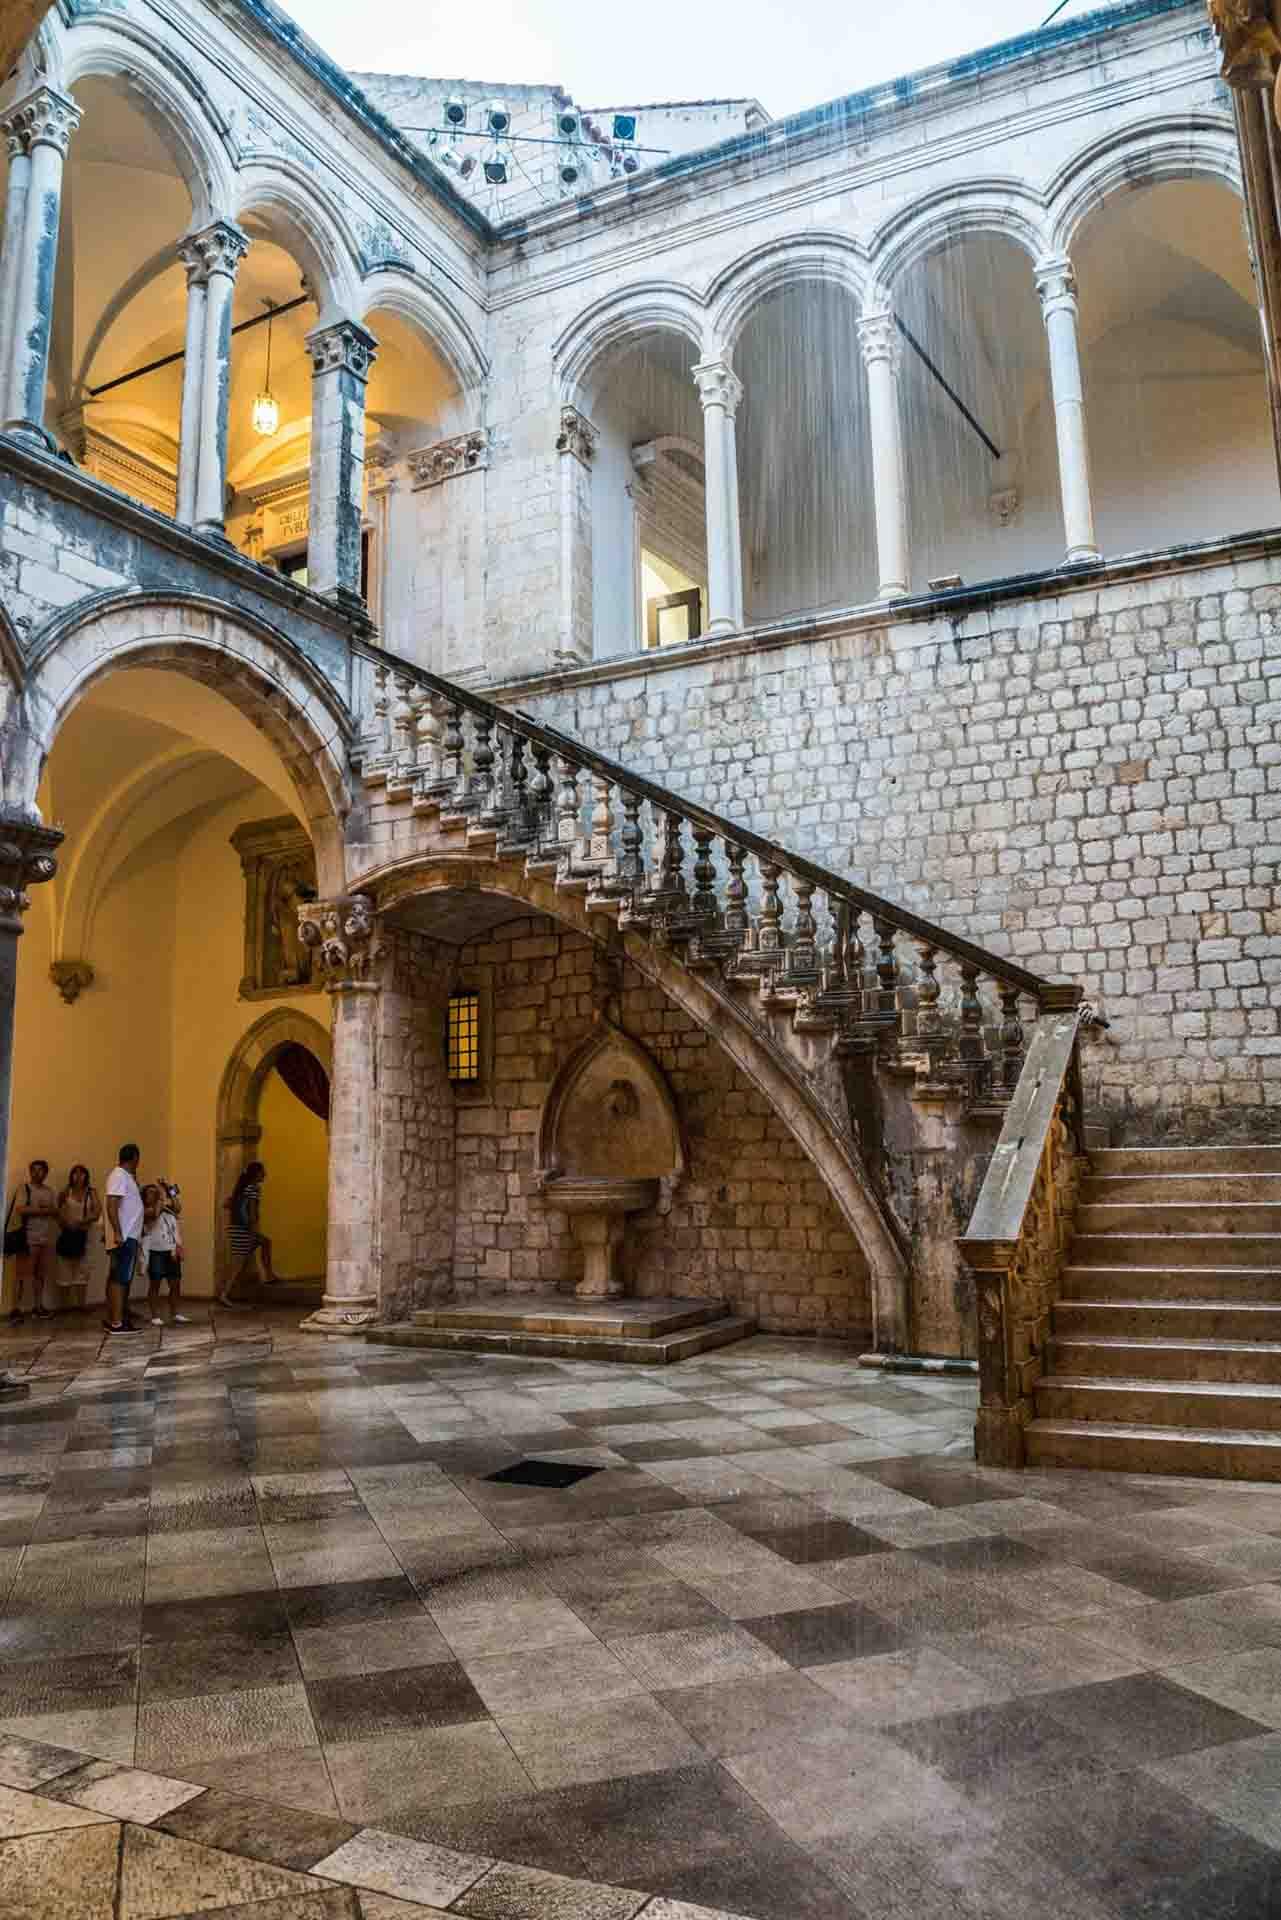 Croatia Dubrovnik Rector's Palace, dubrovnik, croatia, pescart, photo blog, travel blog, blog, photo travel blog, enrico pescantini, pescantini